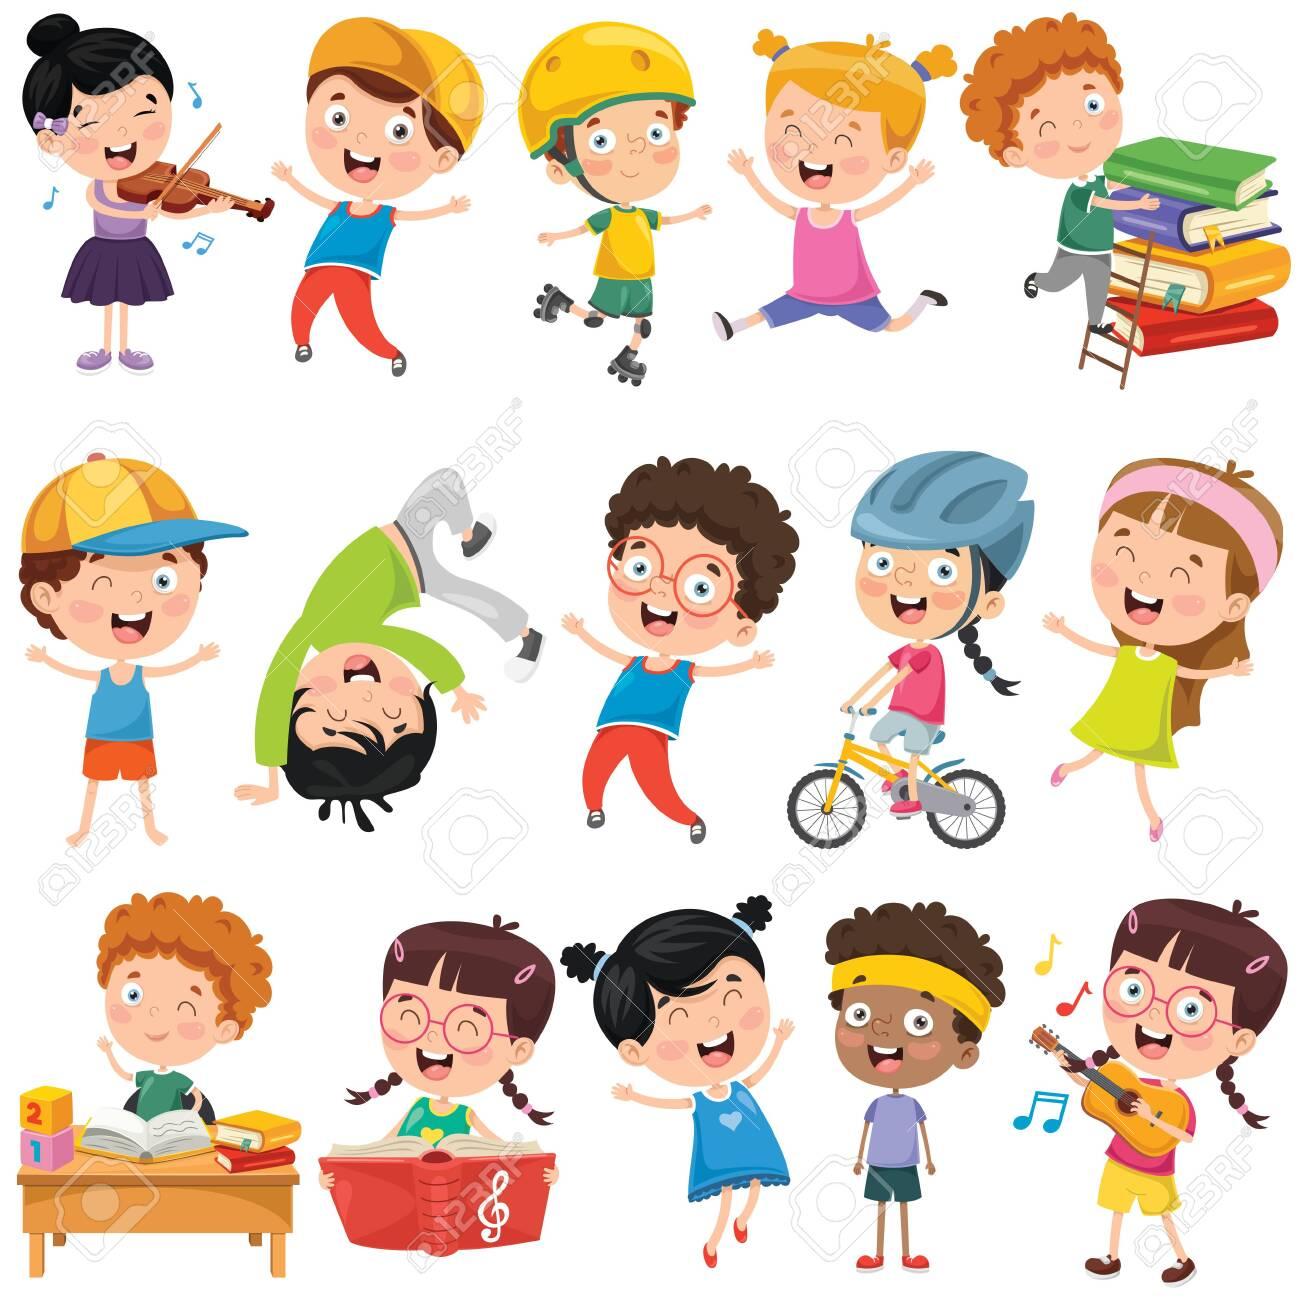 Collection Of Little Cartoon Children - 133192217